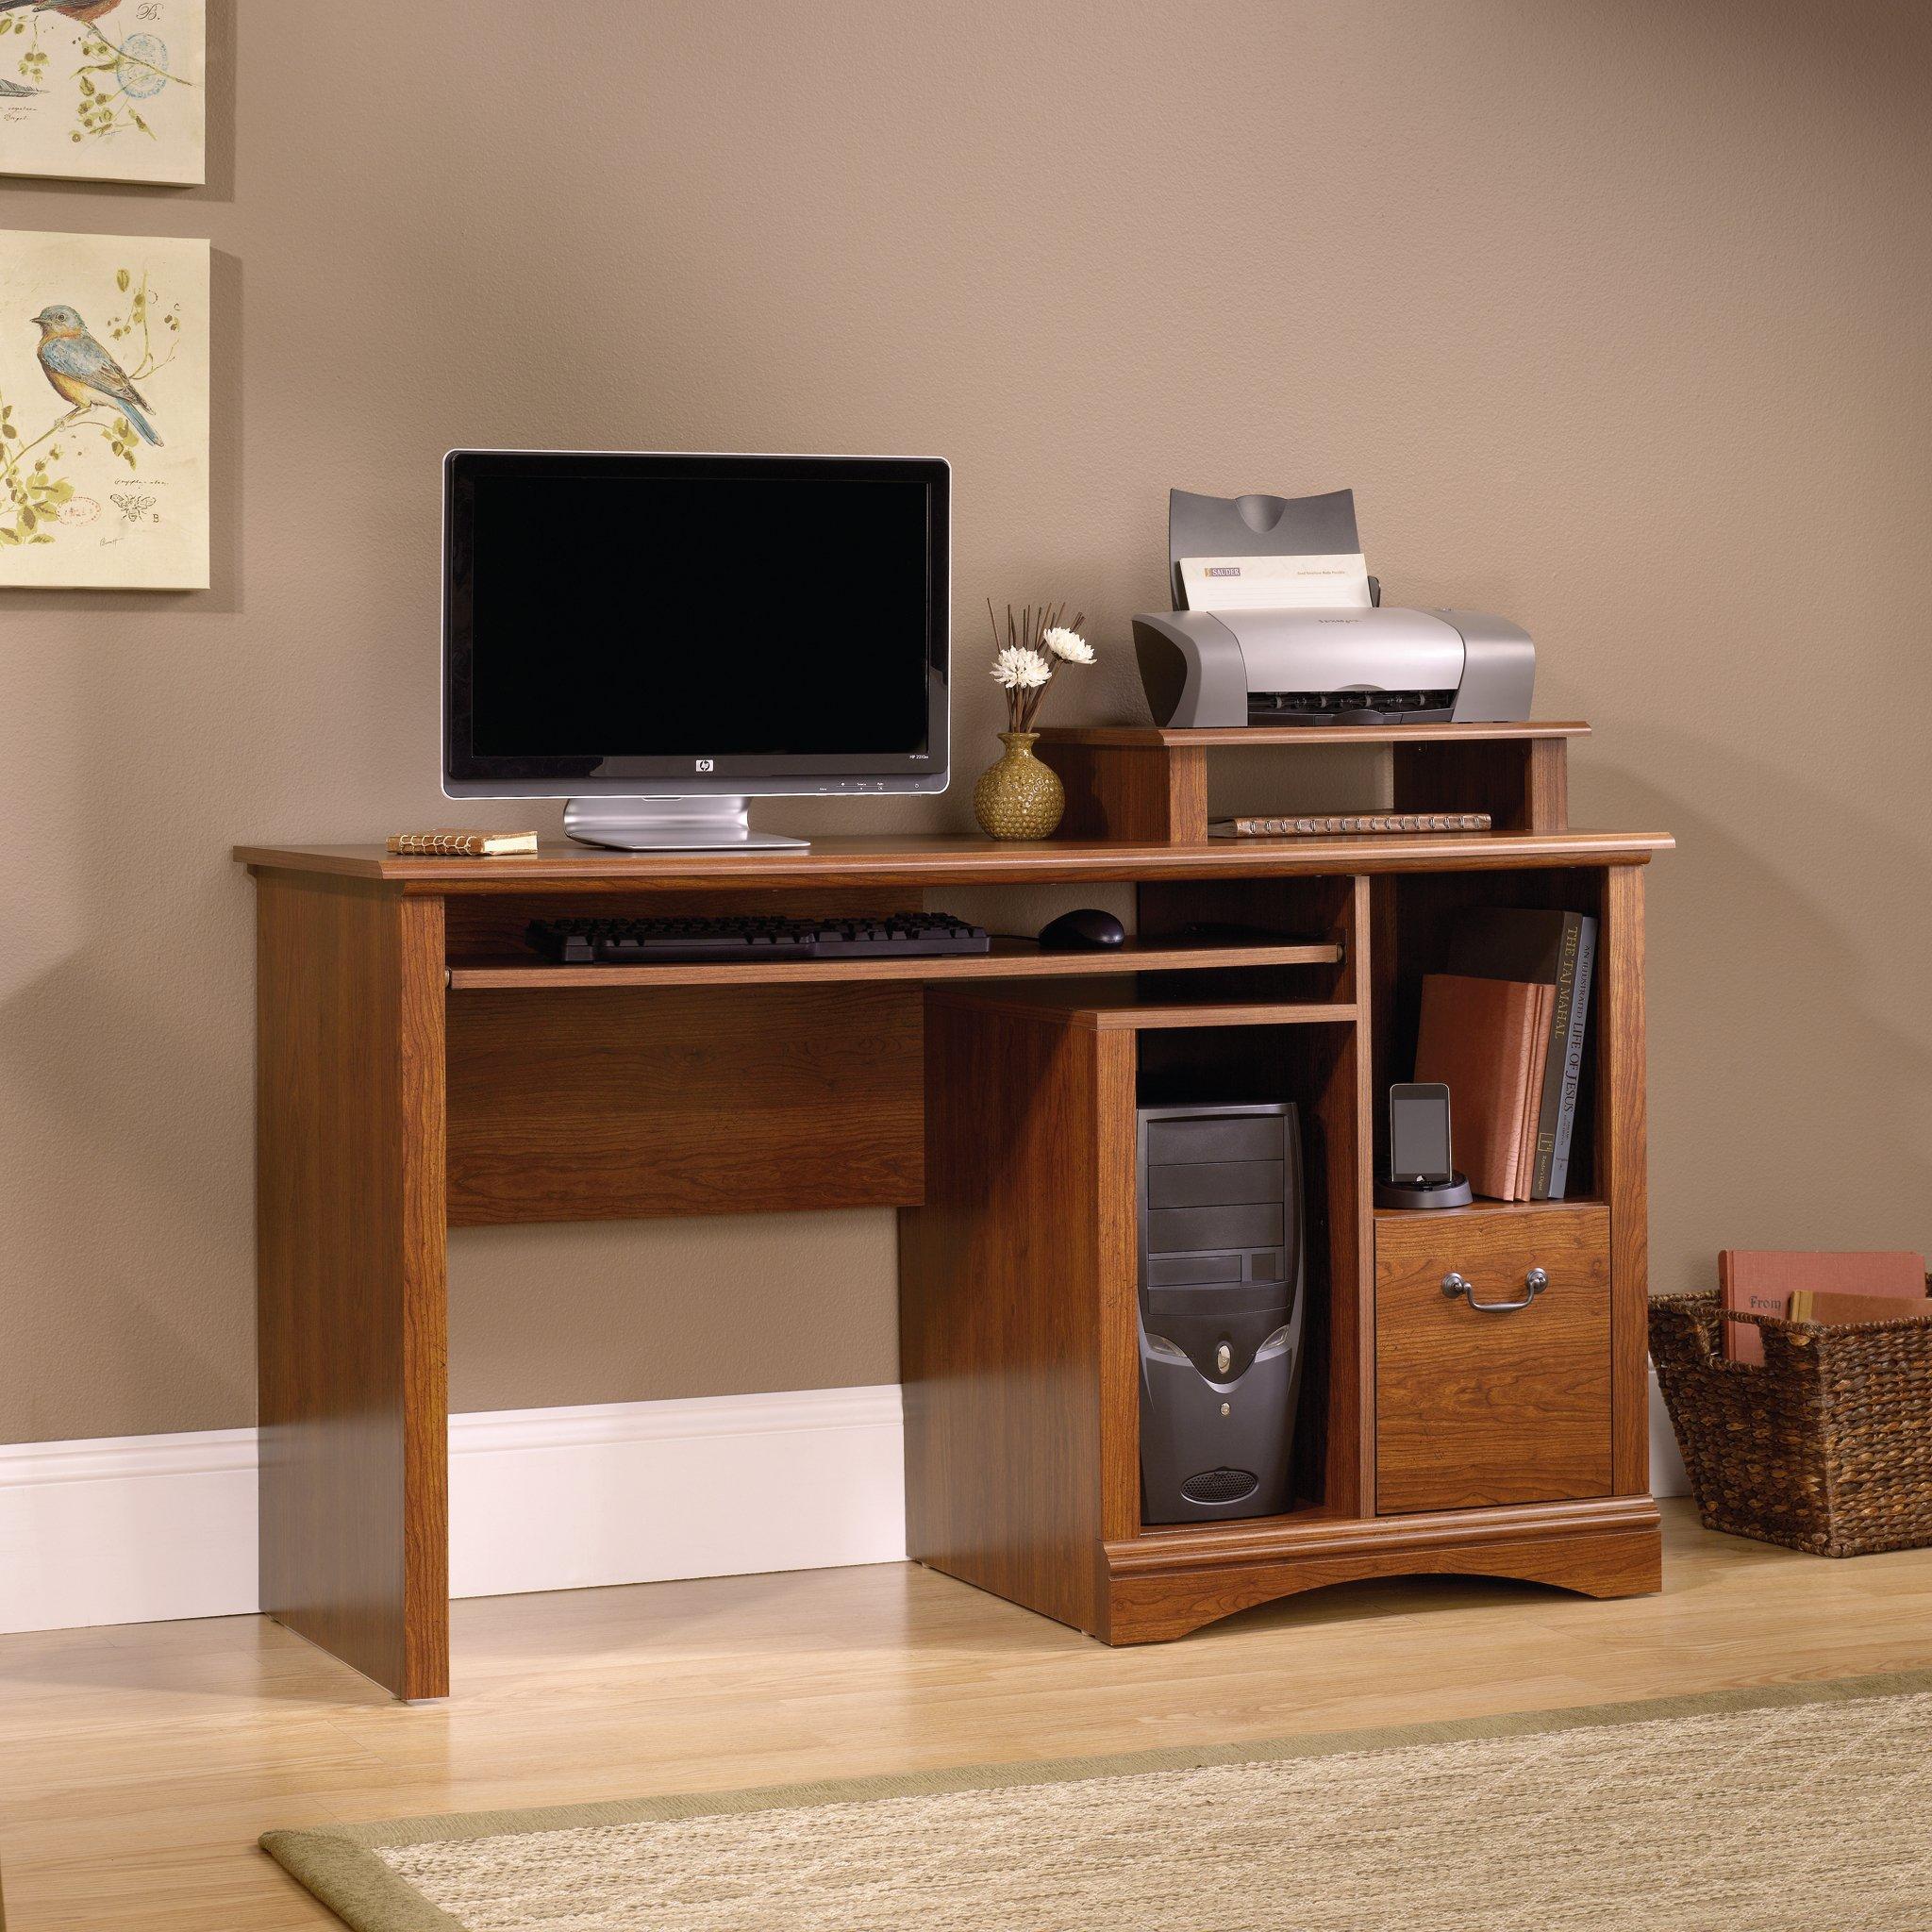 Sauder 101730 Camden County Computer Desk, L: 53.54'' x W: 20.28'' x H: 34.57'', Planked Cherry finish by Sauder